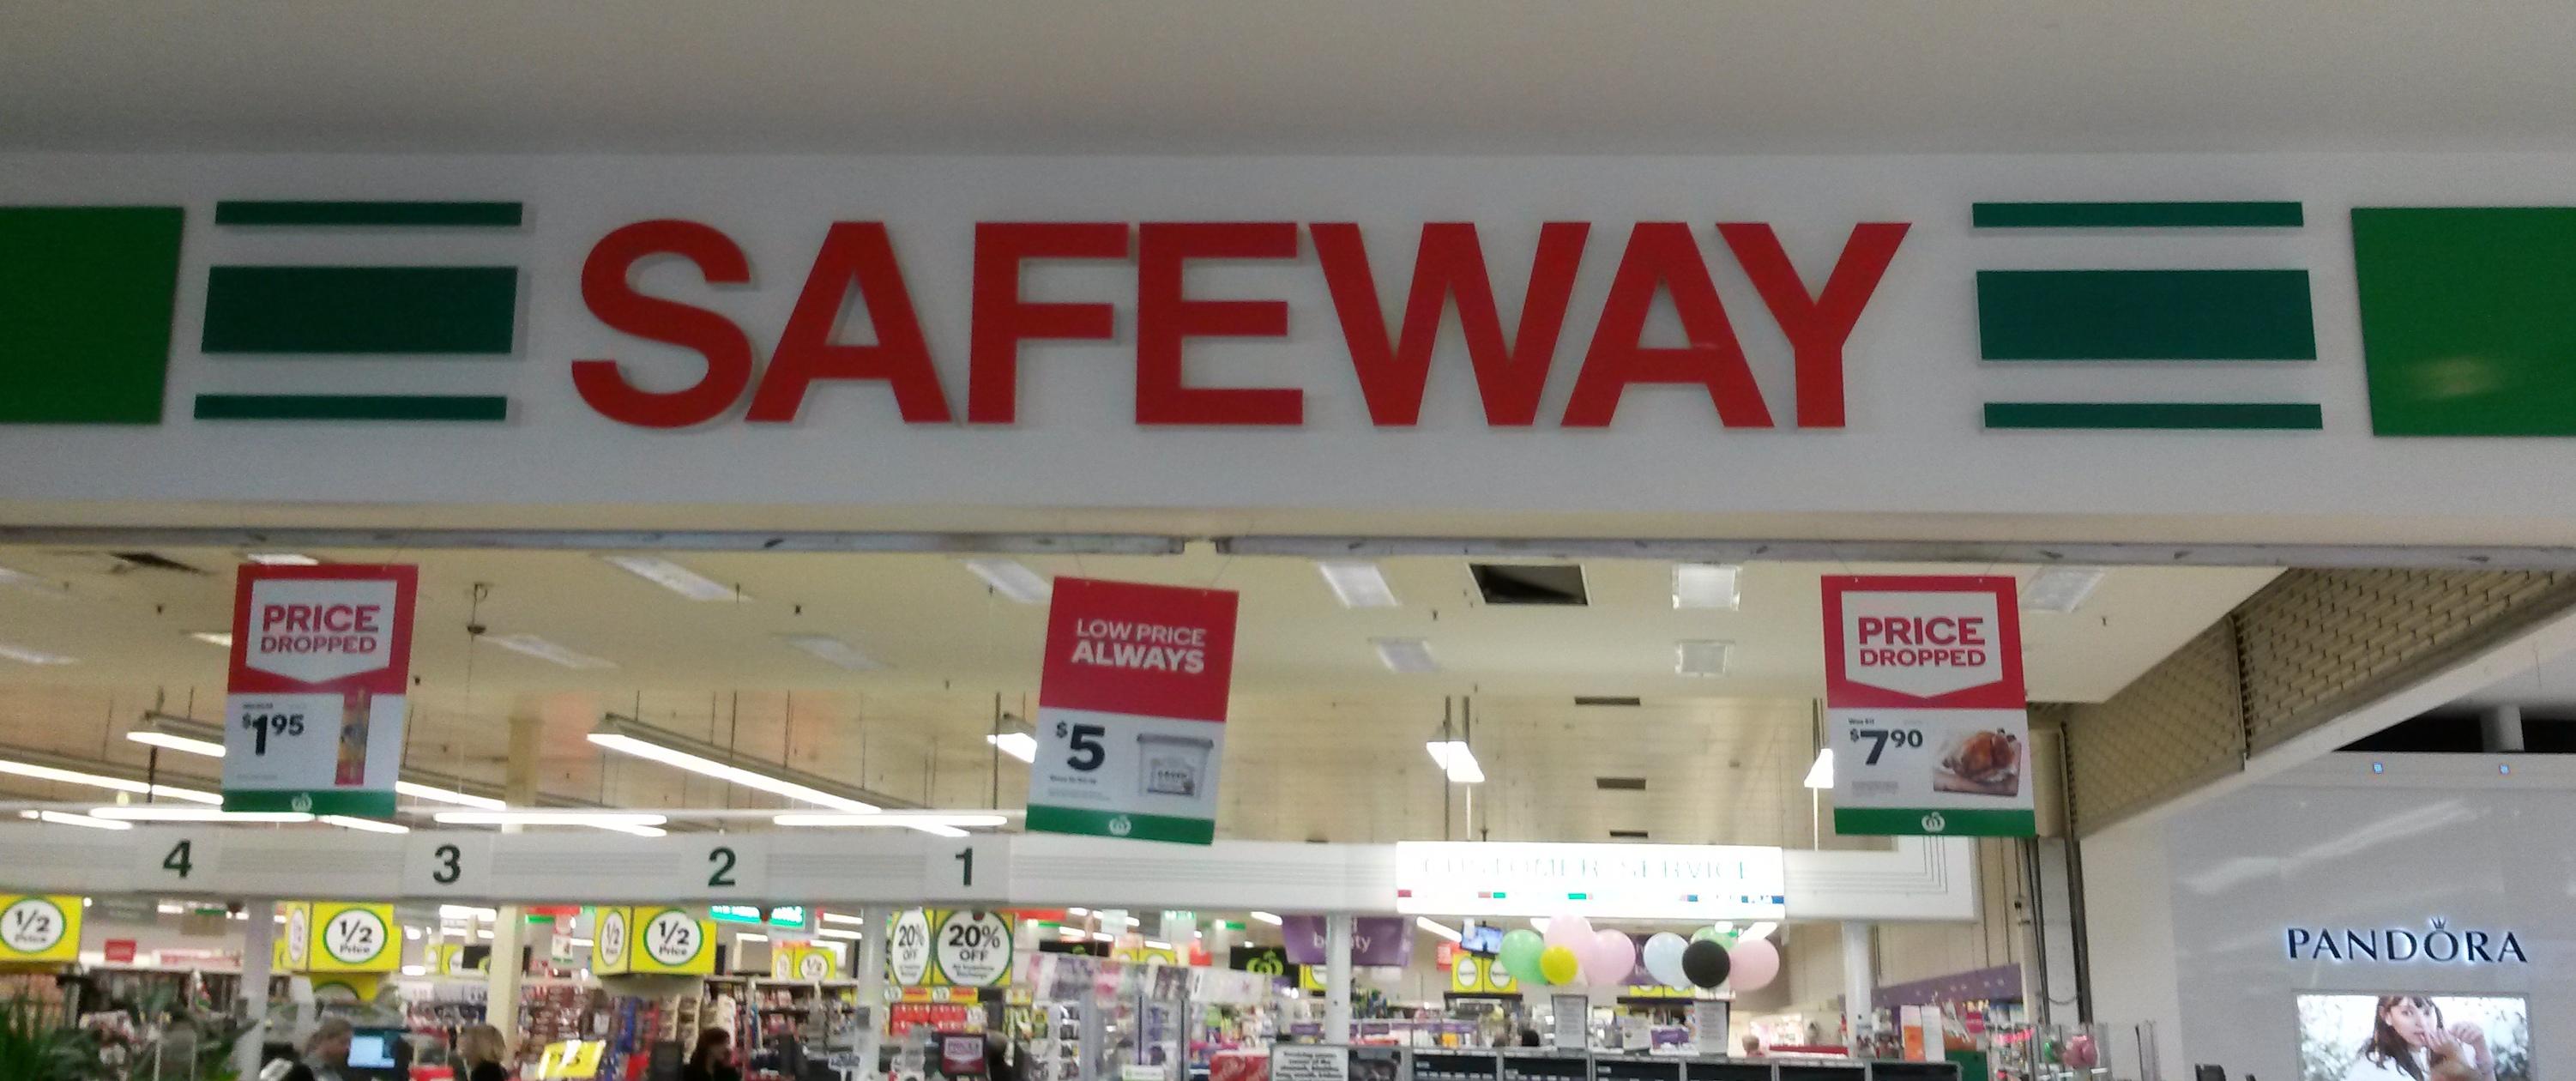 Safeway Australia Wikipedia